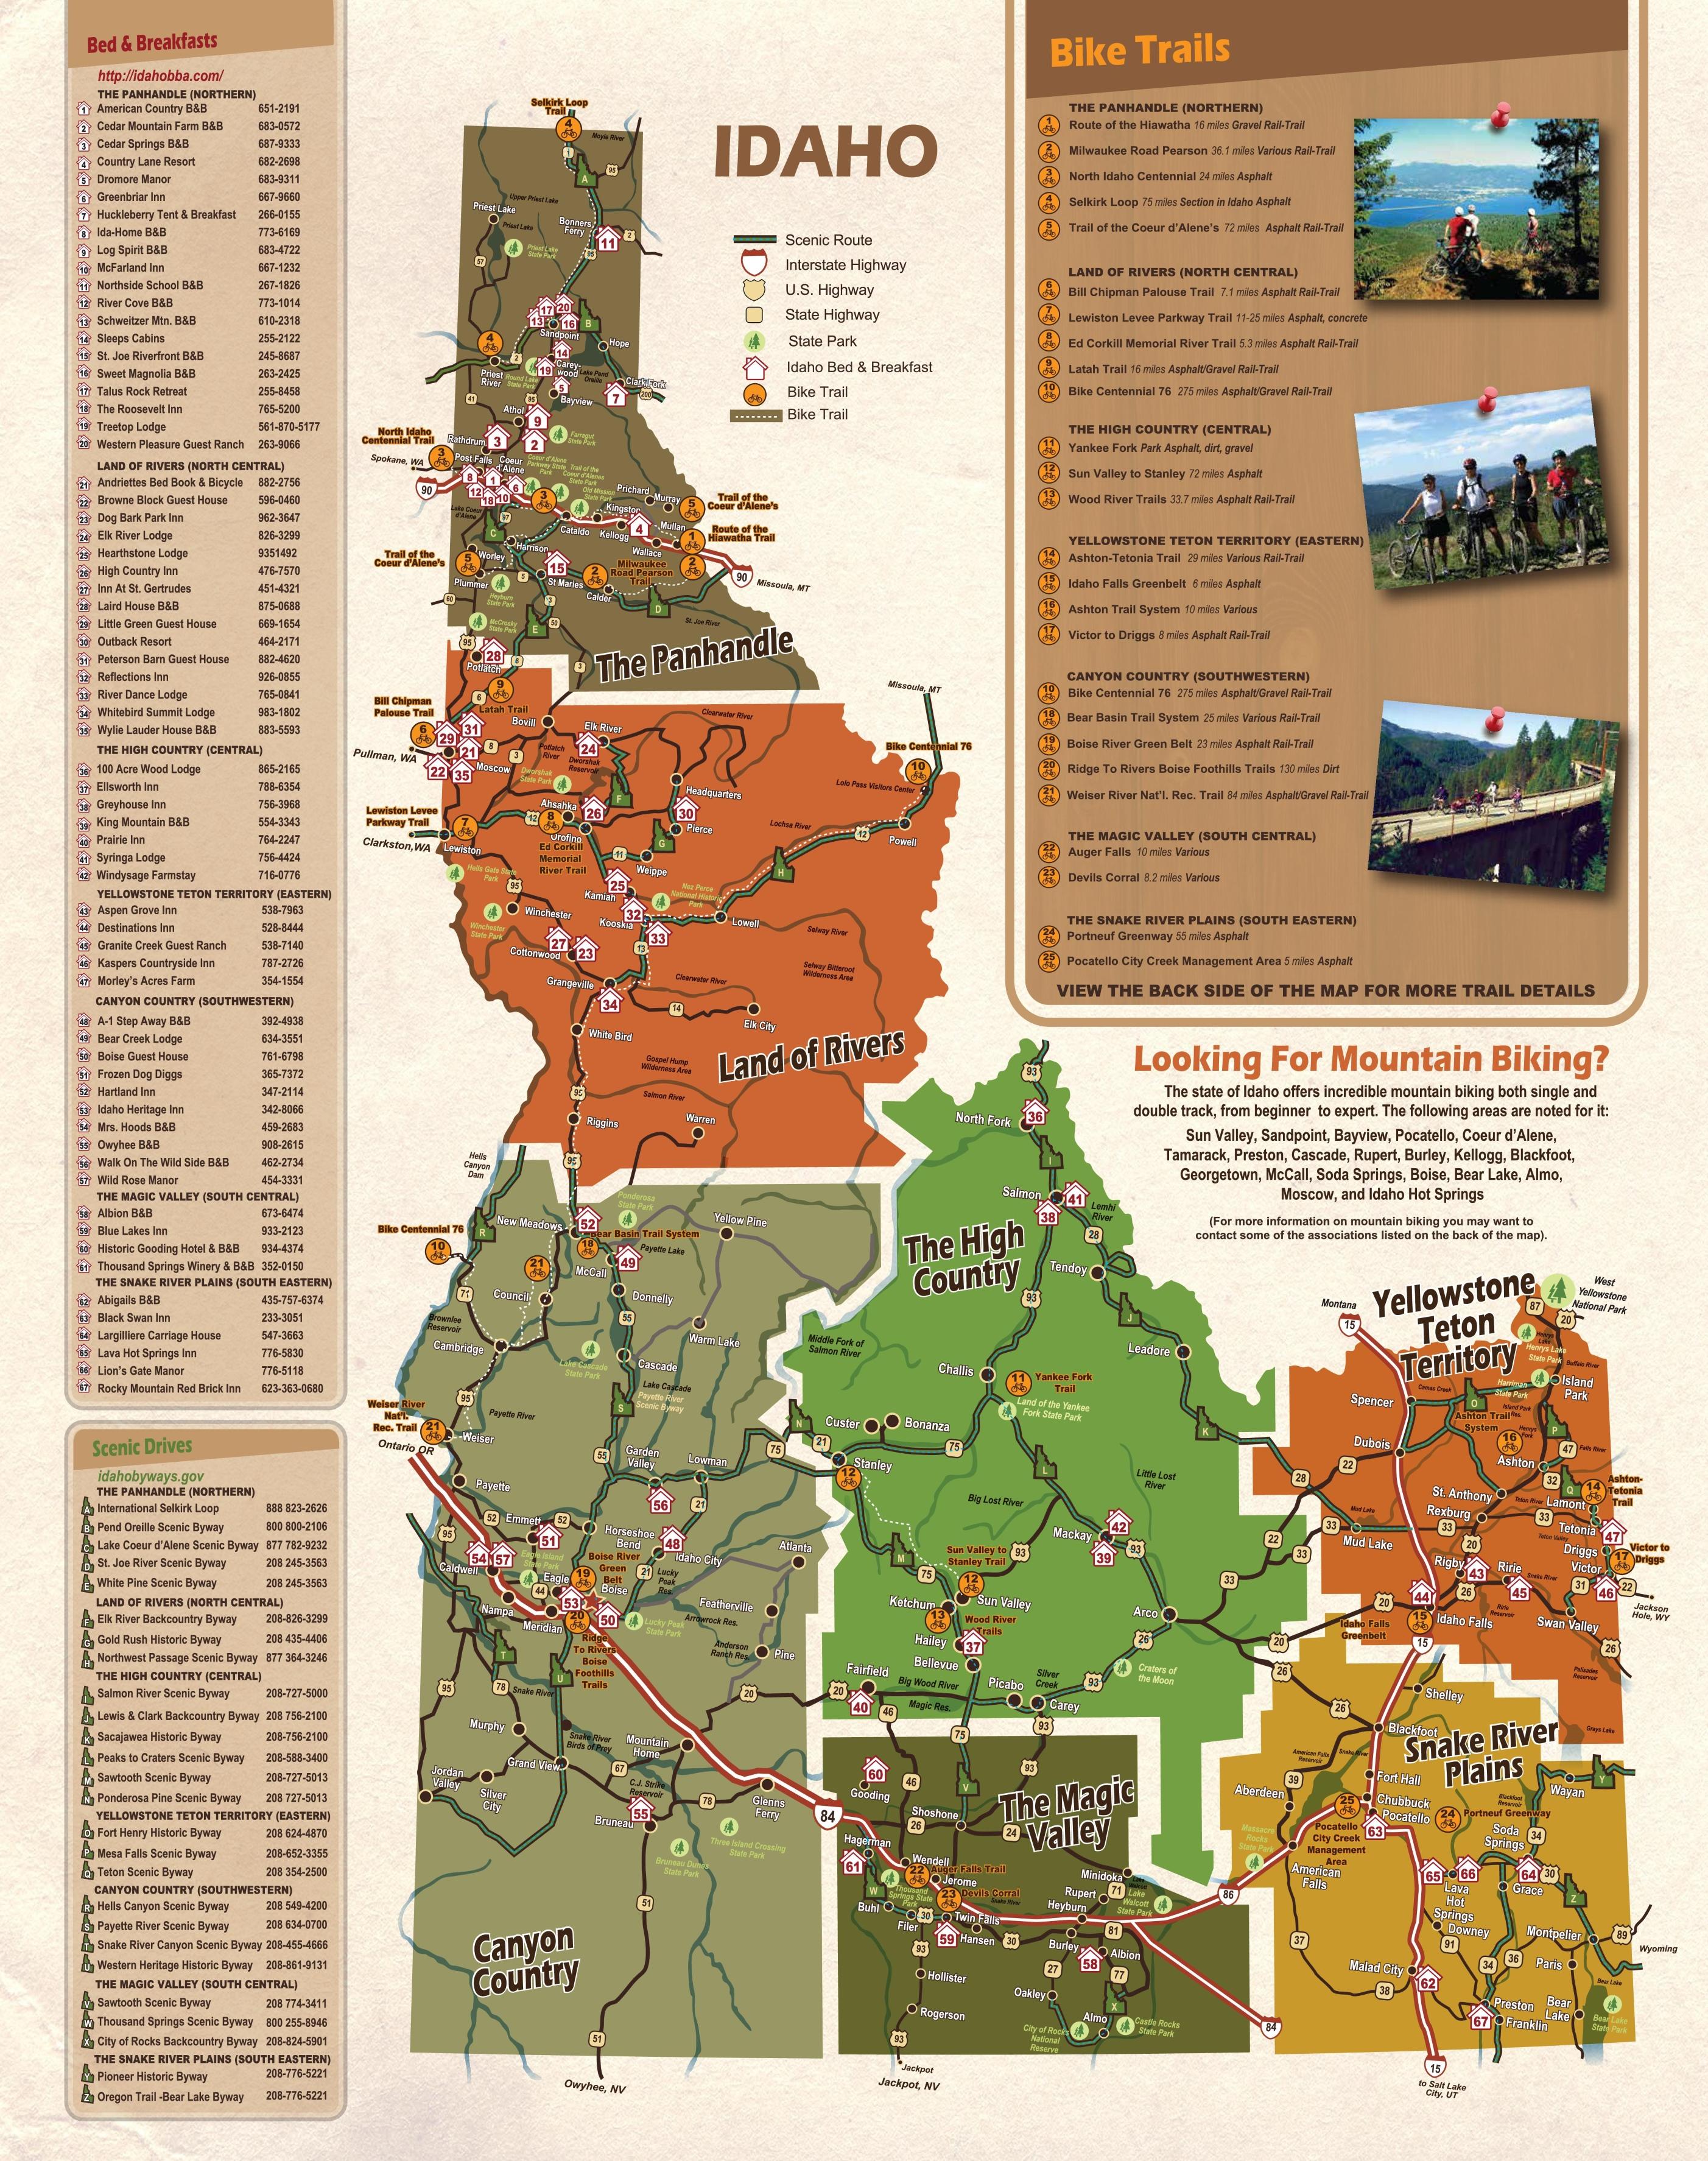 Idaho tourist map